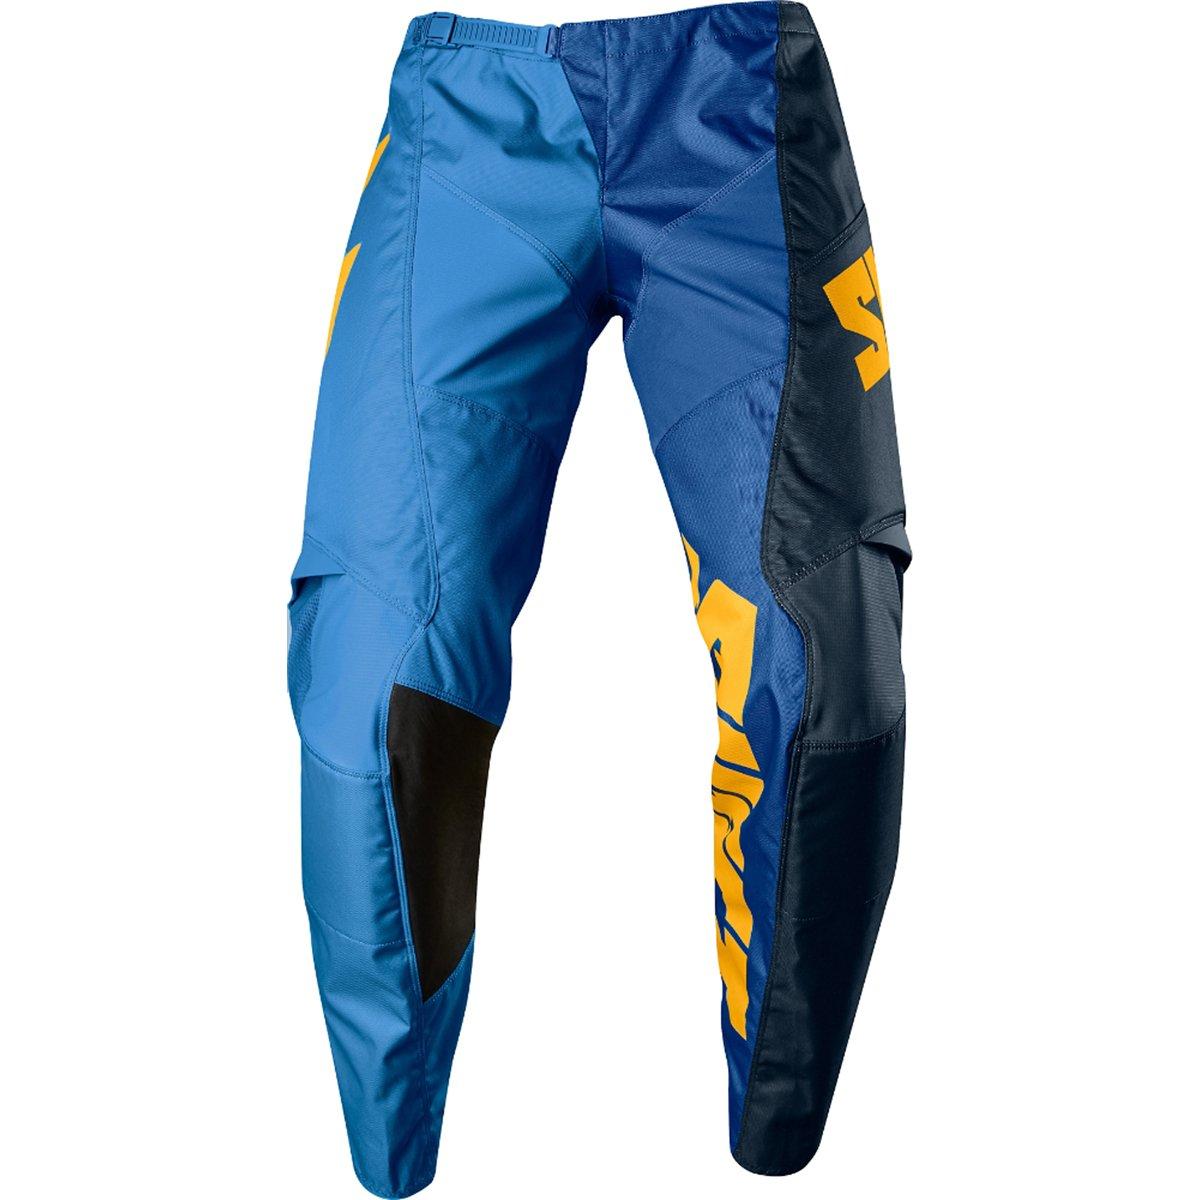 2018 Shift White Label Tarmac Pants-Blue-34